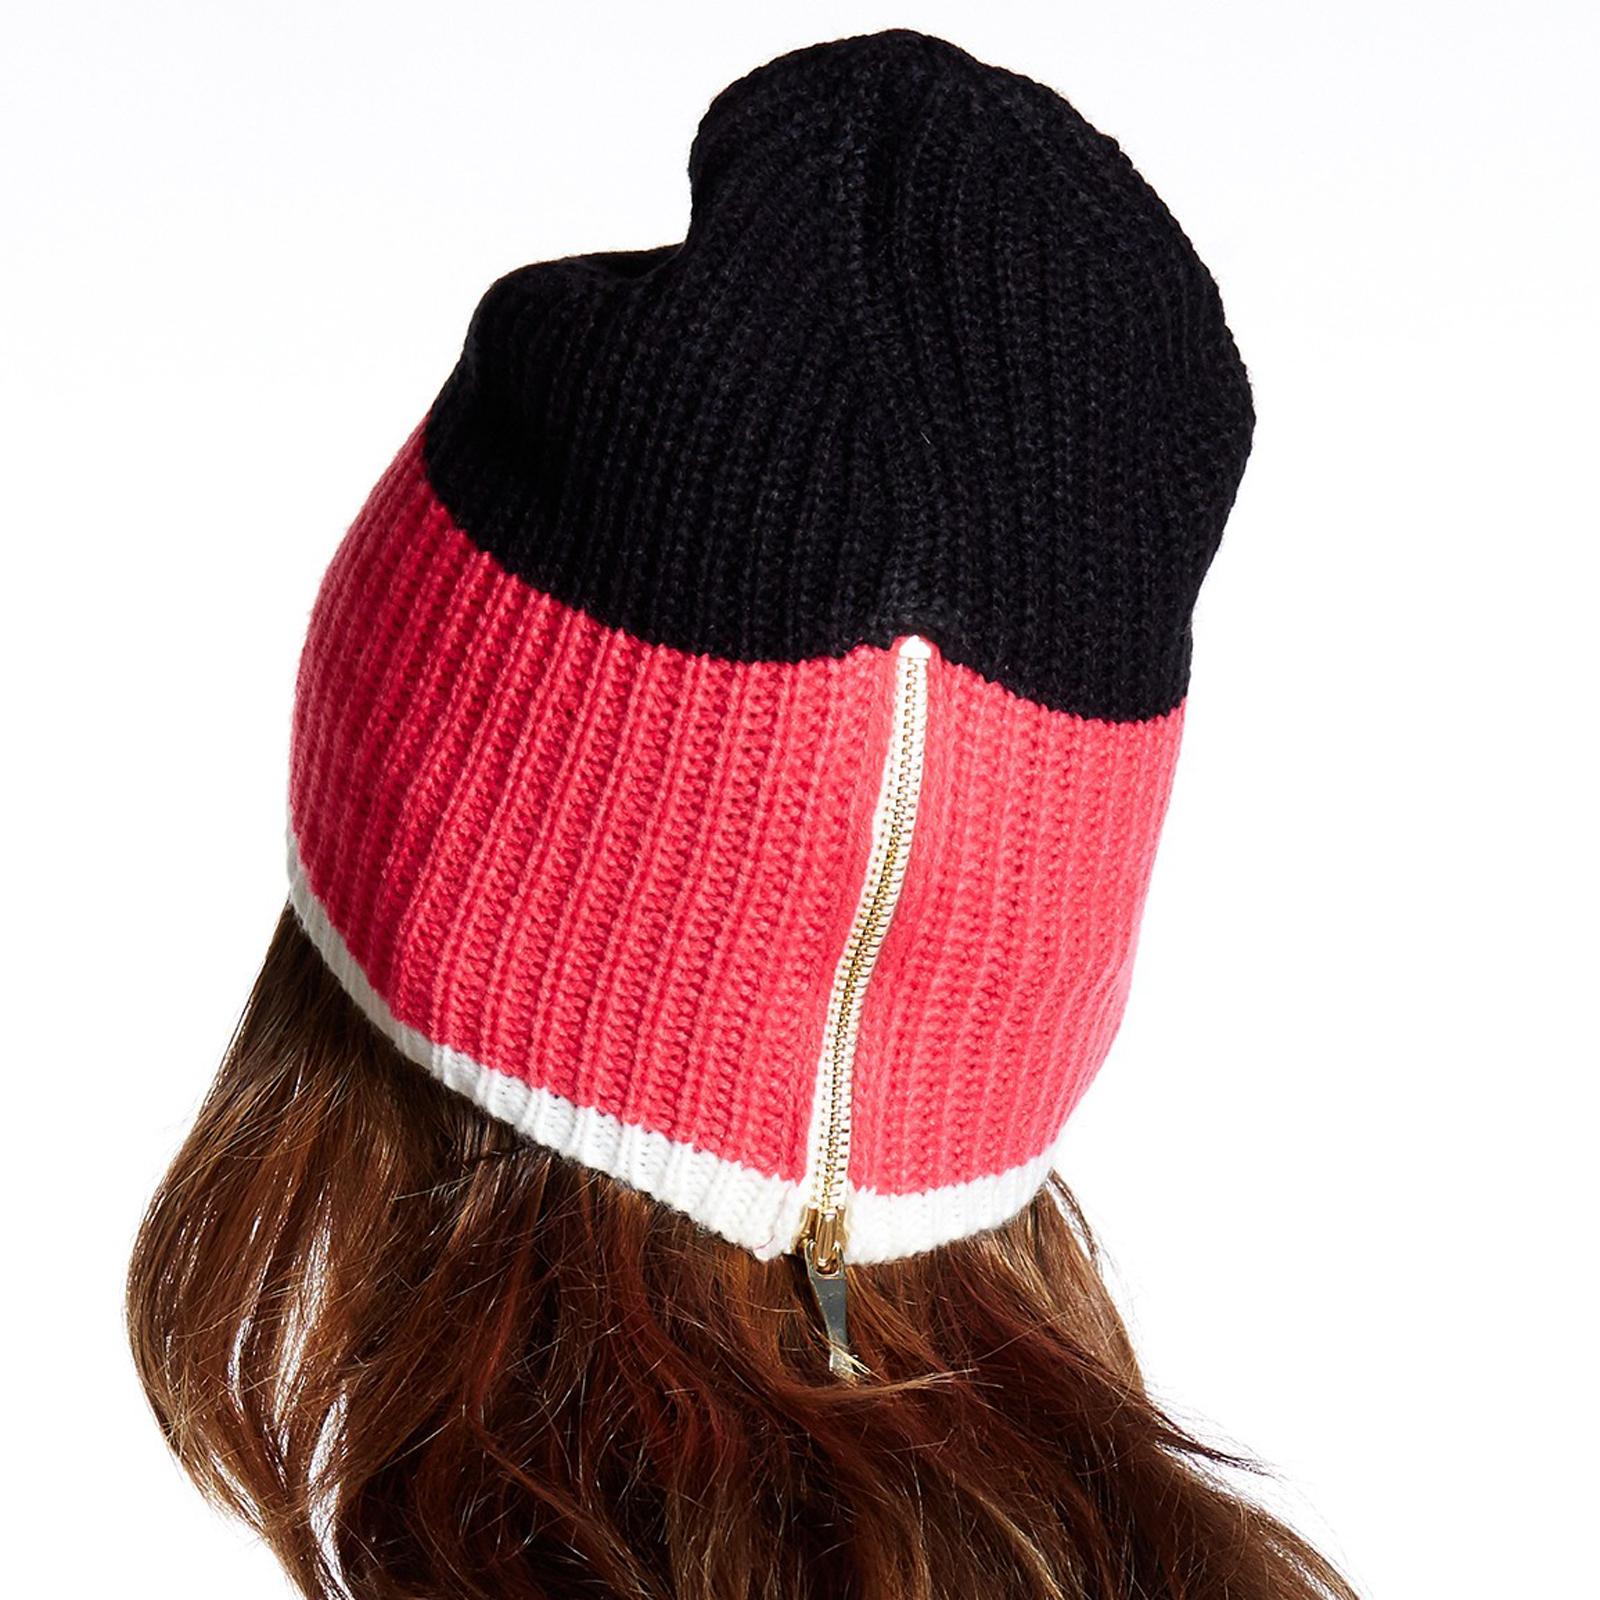 Pungles - Online Store - Rib Knit Zip-up Back Black Pink Cream ... f10c19740d7